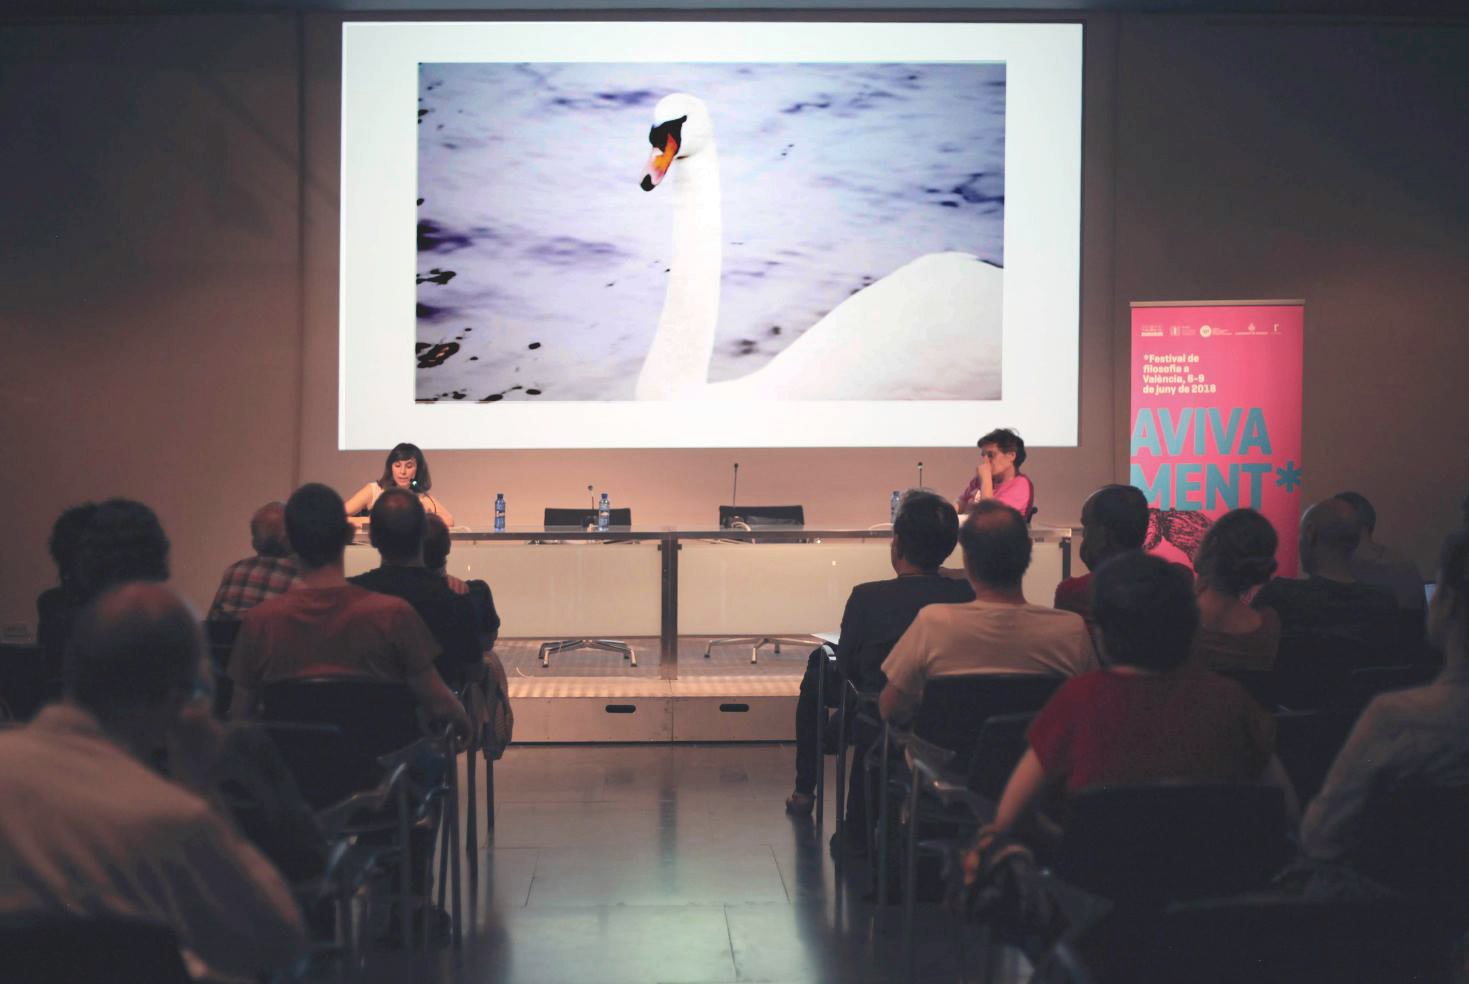 FINGER AND SWAN. Avivament Festival de Filosofia a València. 2018